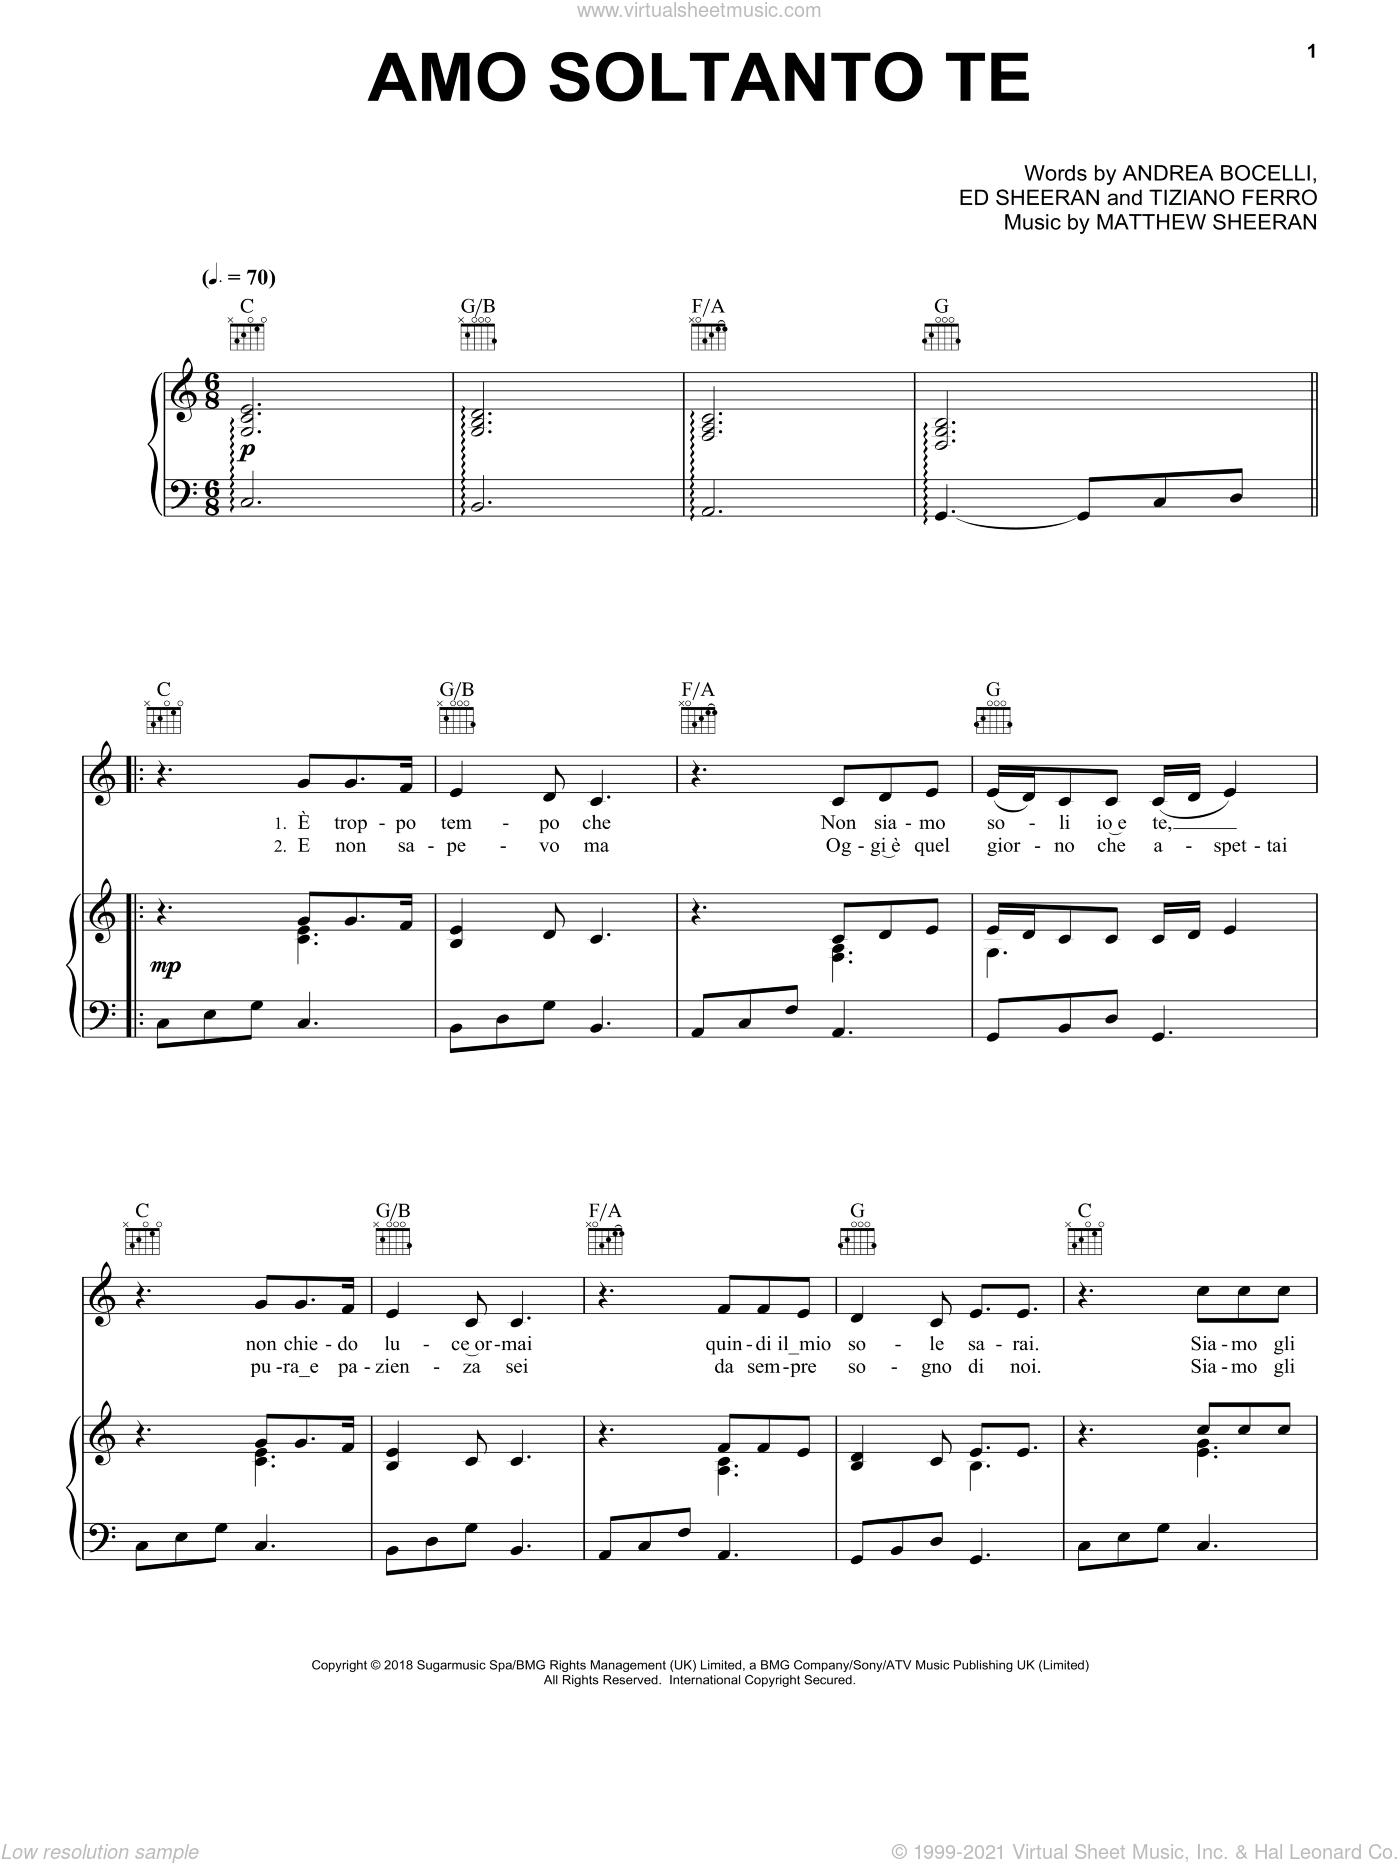 Amo soltanto te (feat. Ed Sheeran) sheet music for voice, piano or guitar by Andrea Bocelli, Ed Sheeran, Matthew Sheeran and Tiziano Ferro, intermediate skill level